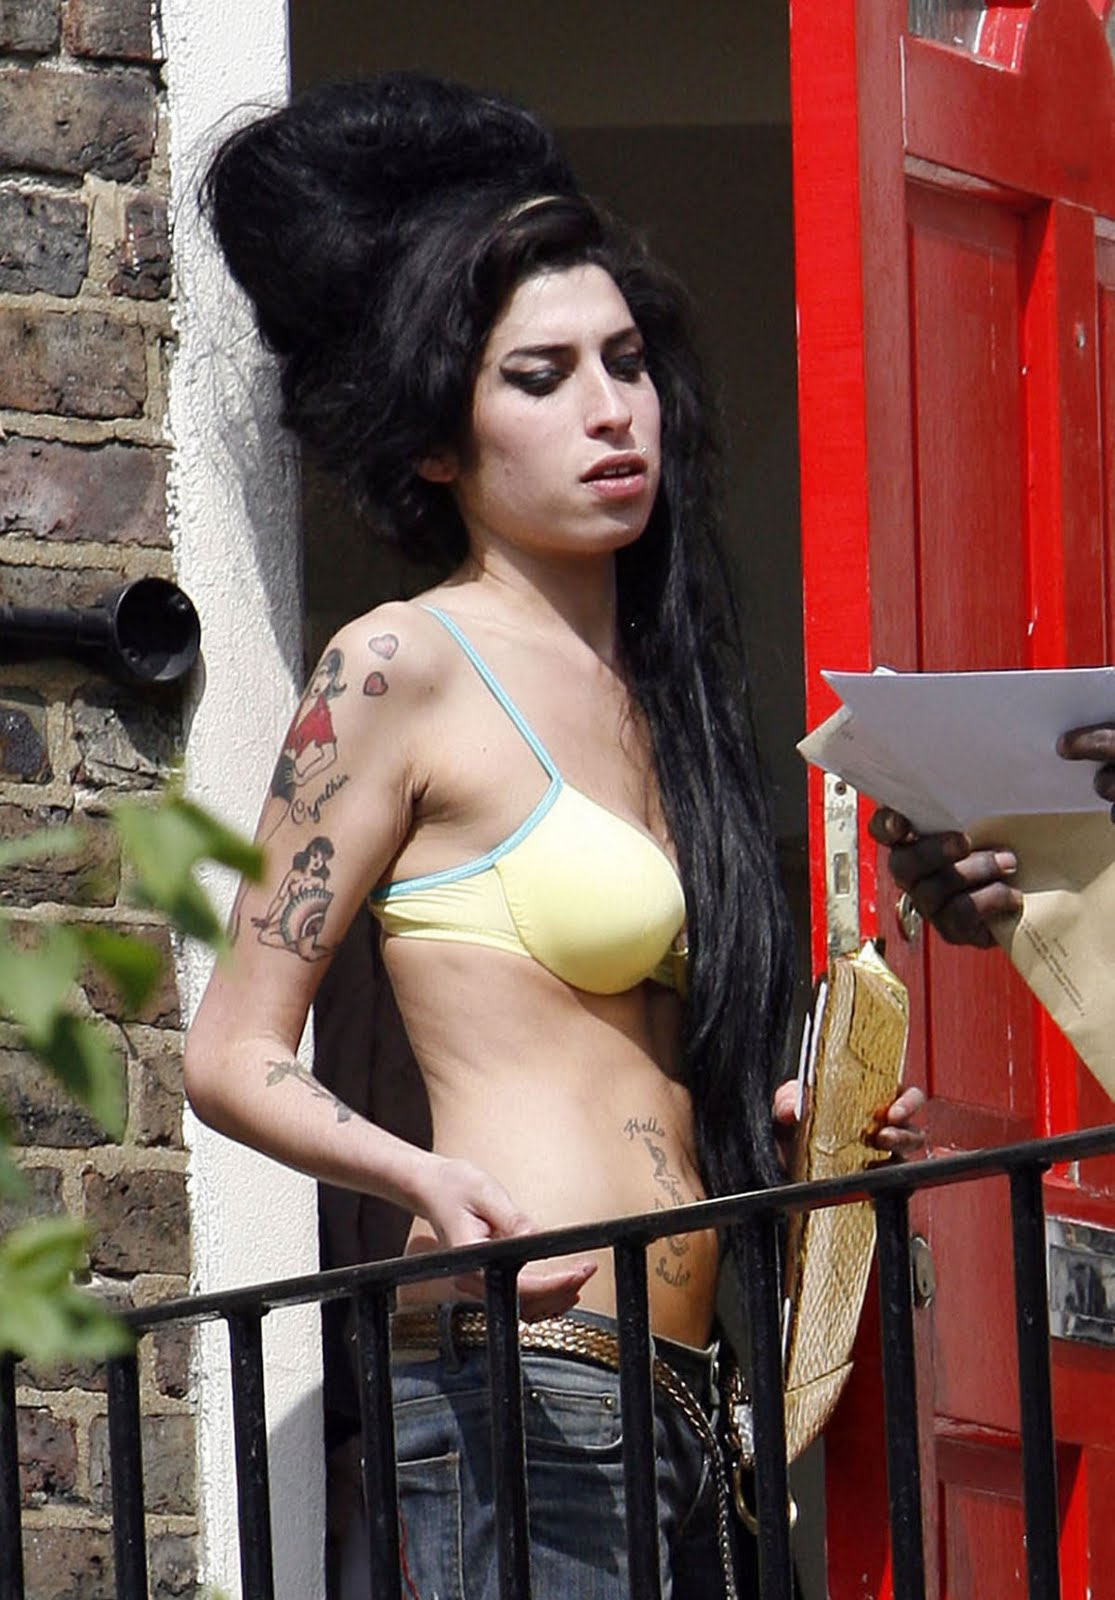 https://1.bp.blogspot.com/_csogD6ptEnI/SwD5iYORFGI/AAAAAAAADhk/l5eOHFCGSXI/s1600/Amy_Winehouse_06.jpg